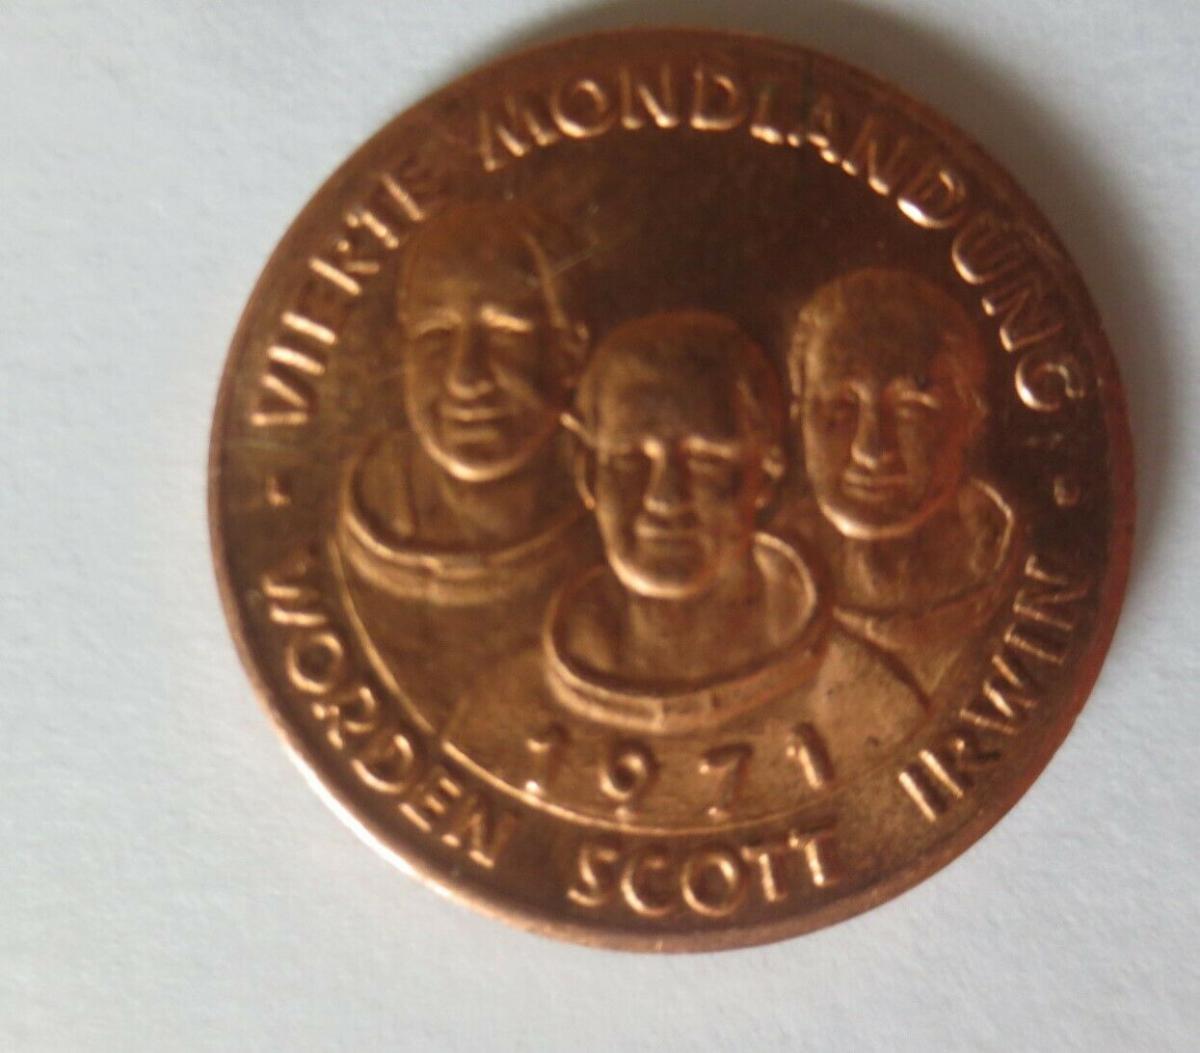 Medaille 1971 Deutschland Apollo 15 - Raumfahrt - Scott - Worden - Irwin ♥(6833) 0